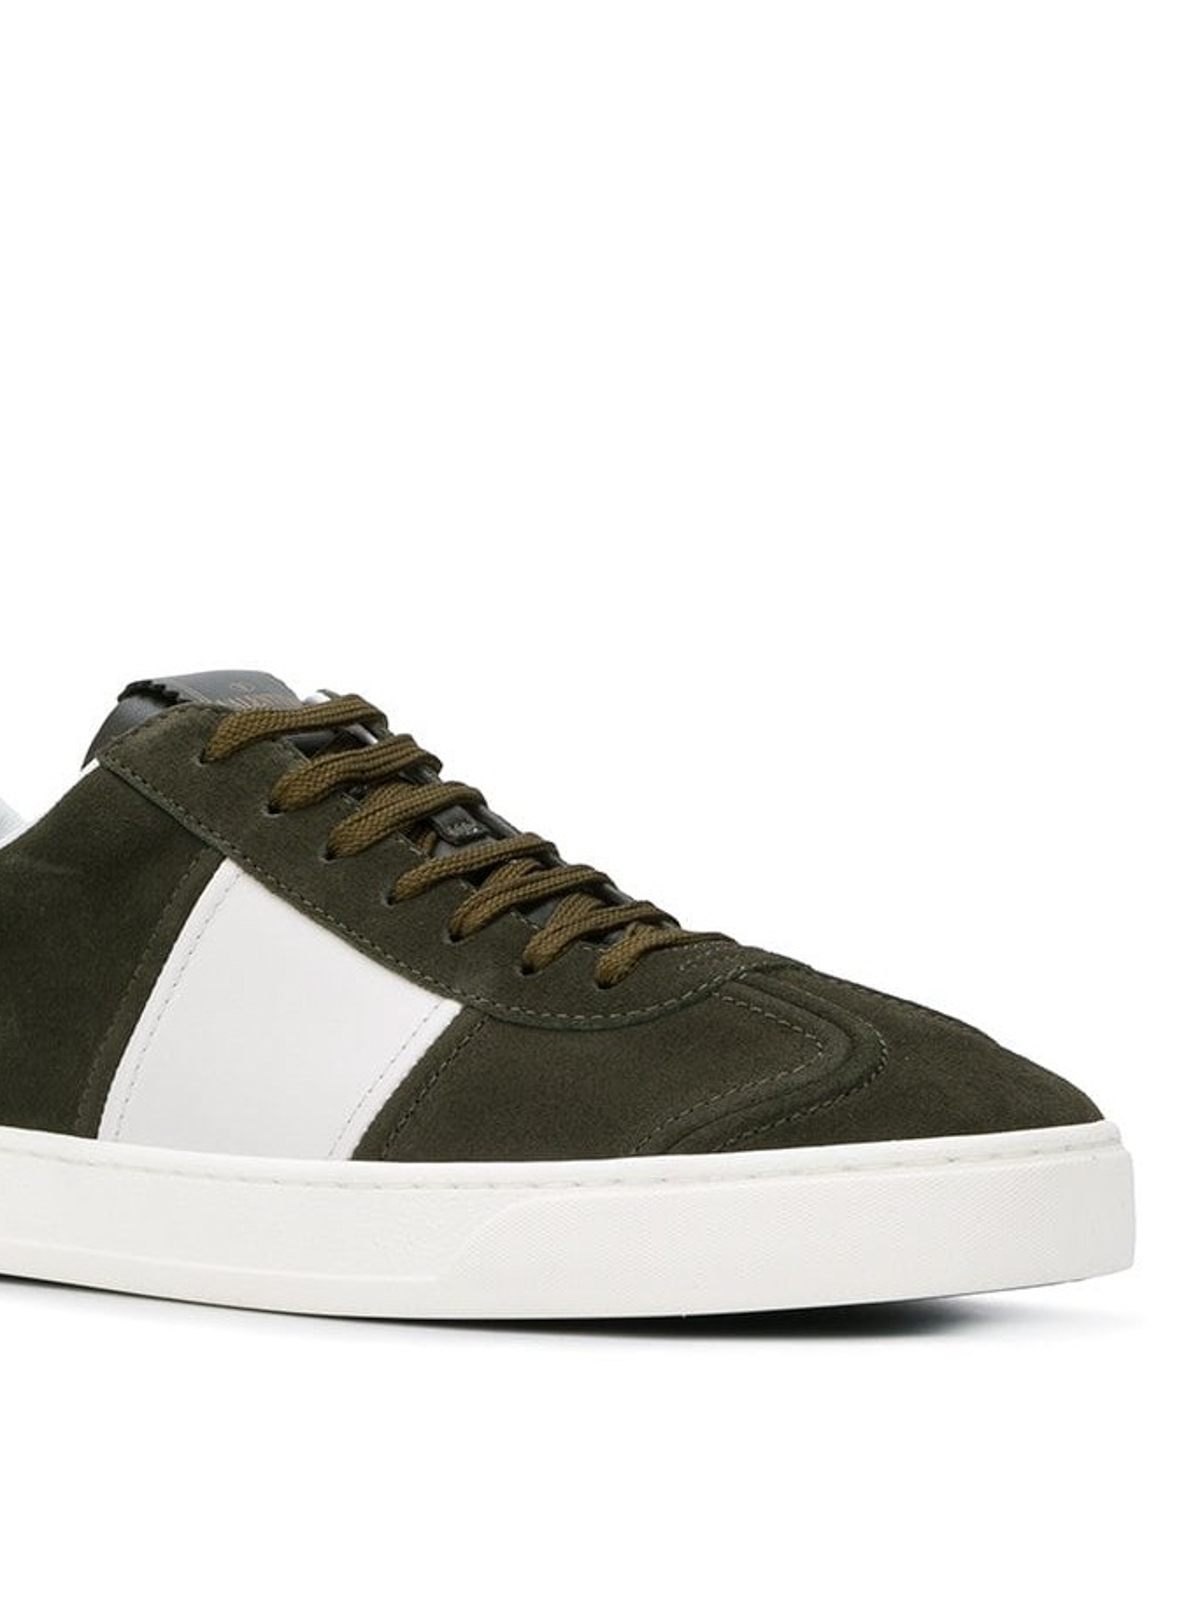 5893c7e05029f iKRIX VALENTINO GARAVANI: trainers - Flycrew green suede sneakers